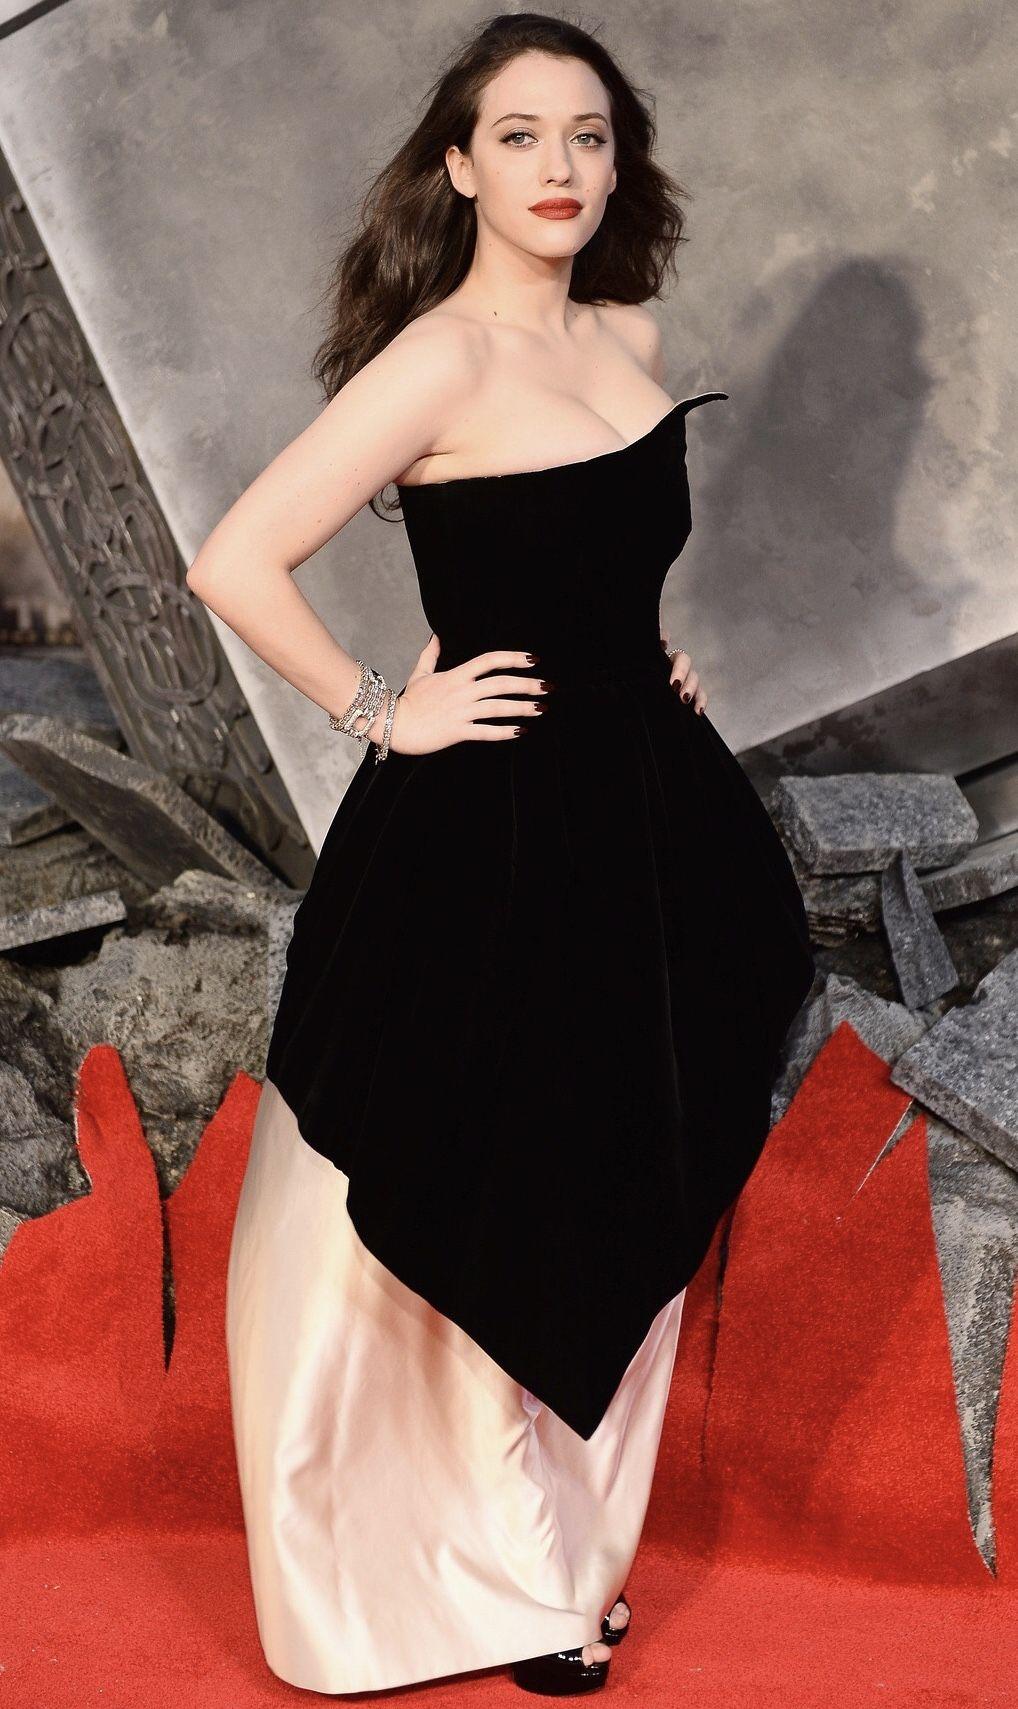 Kat Dennings Kat Dennings Little Black Dress Dresses [ 1709 x 1018 Pixel ]